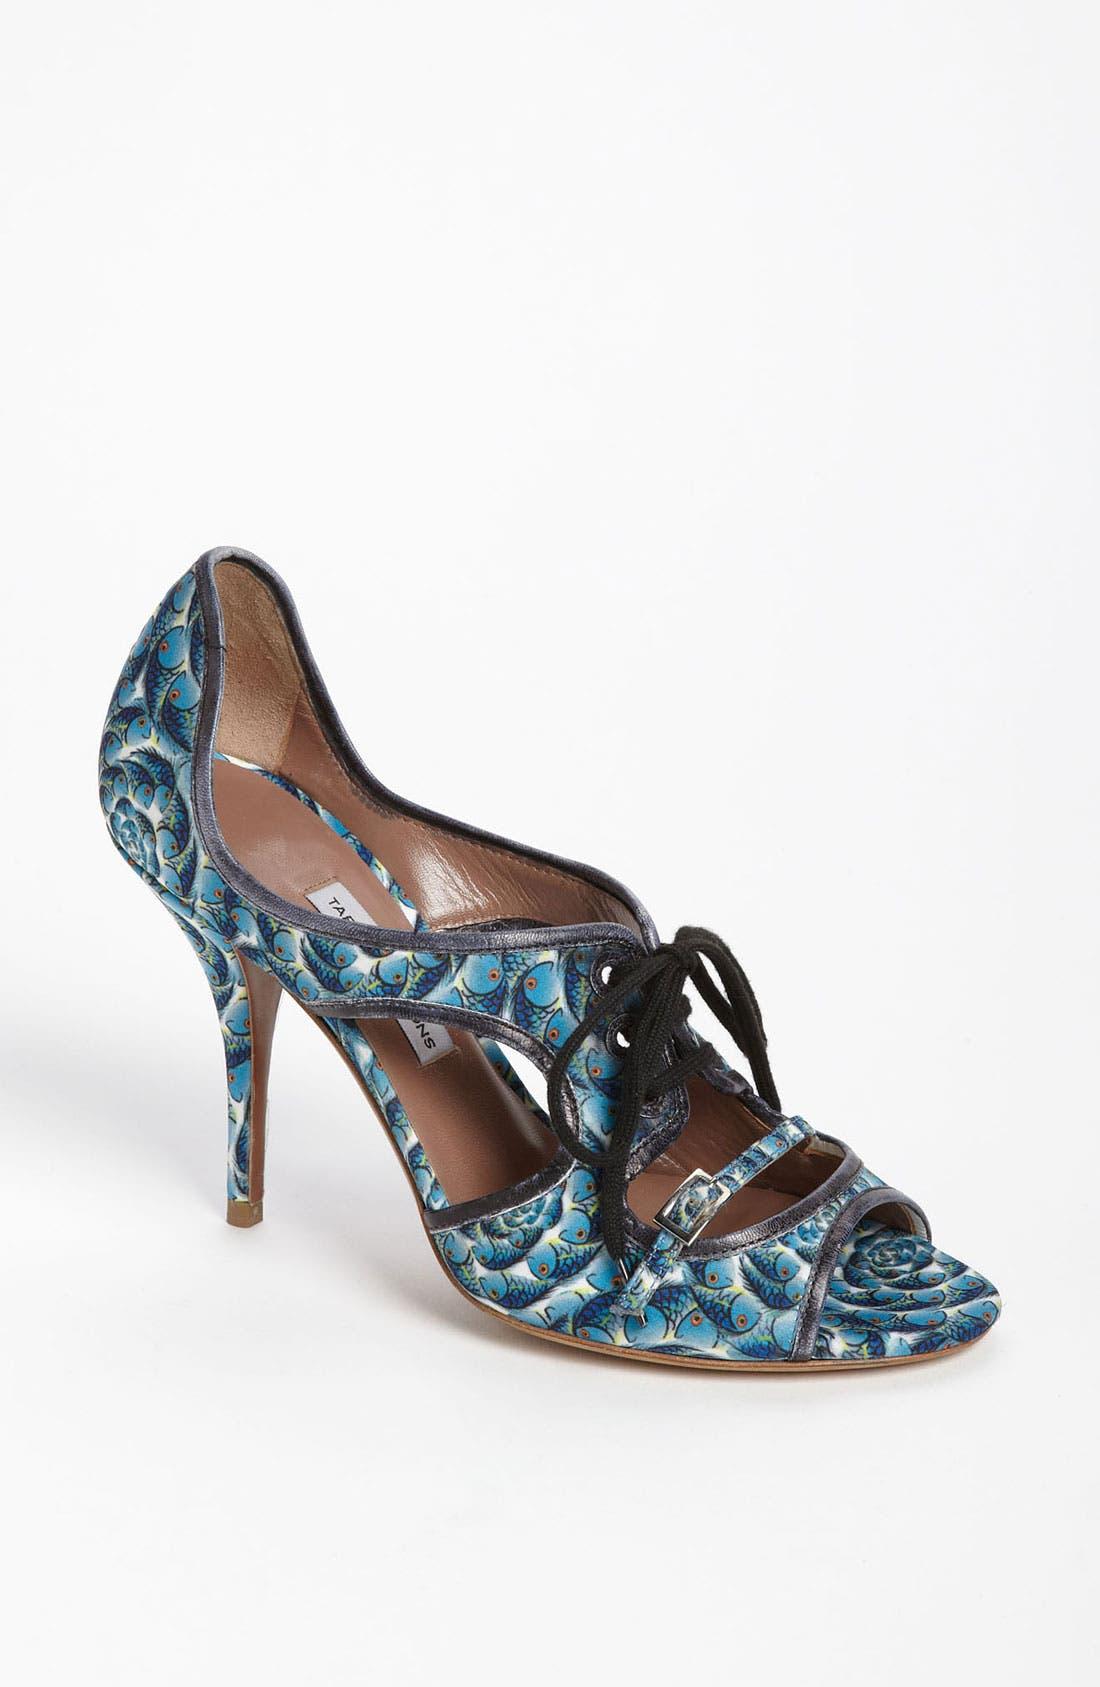 Alternate Image 1 Selected - Tabitha Simmons 'Bertie' Cutout Fish Print Sandal